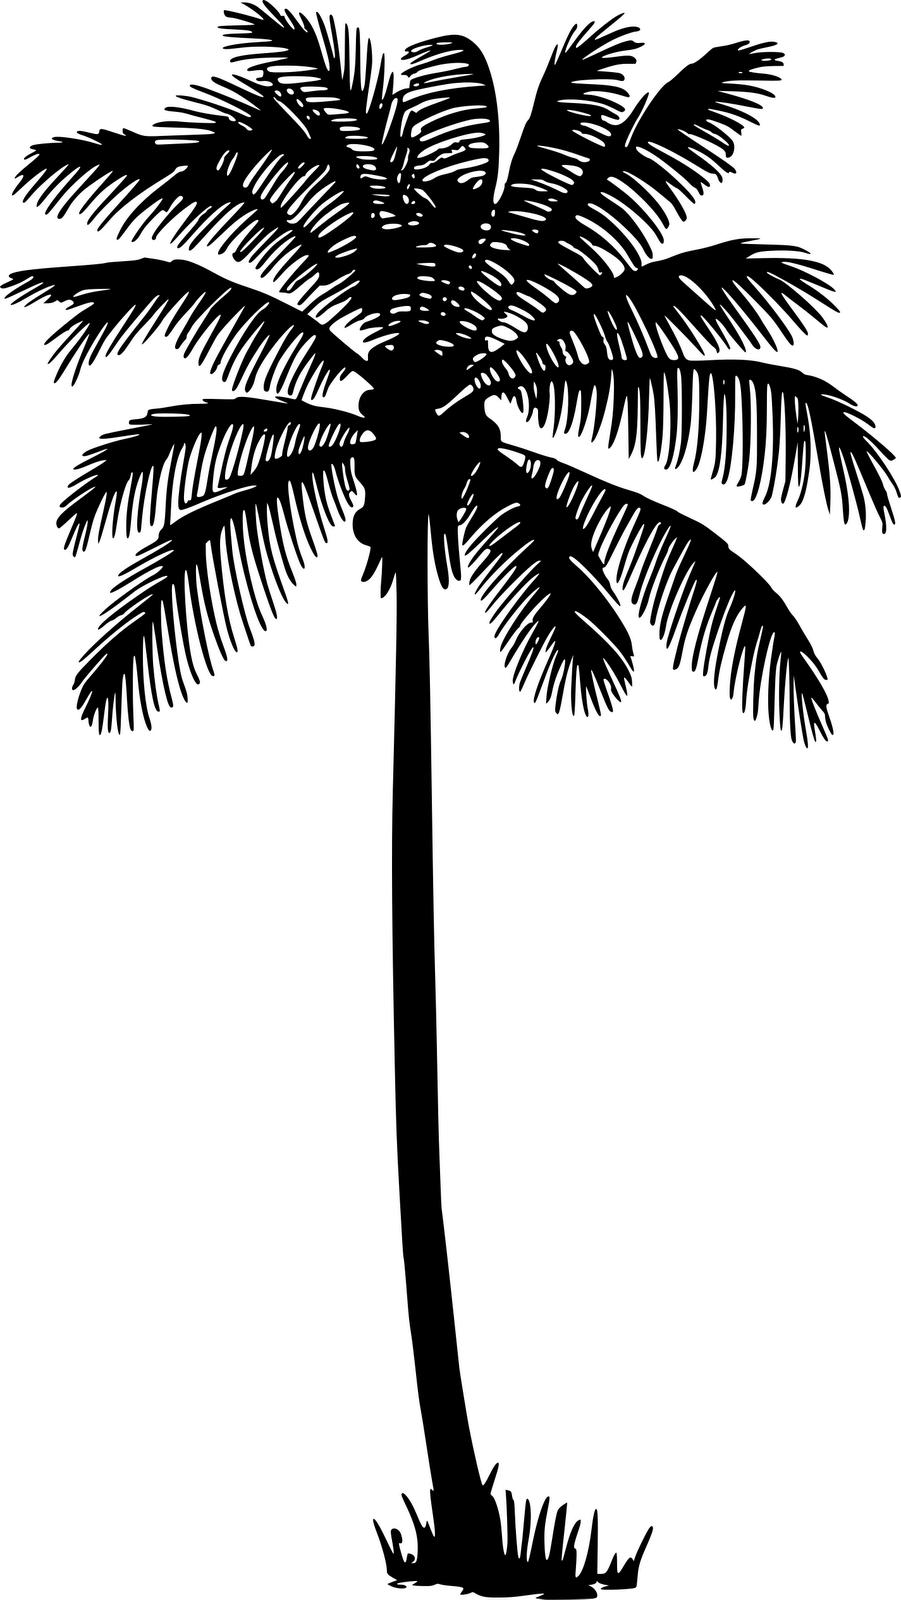 silhouette date palm tree - photo #21